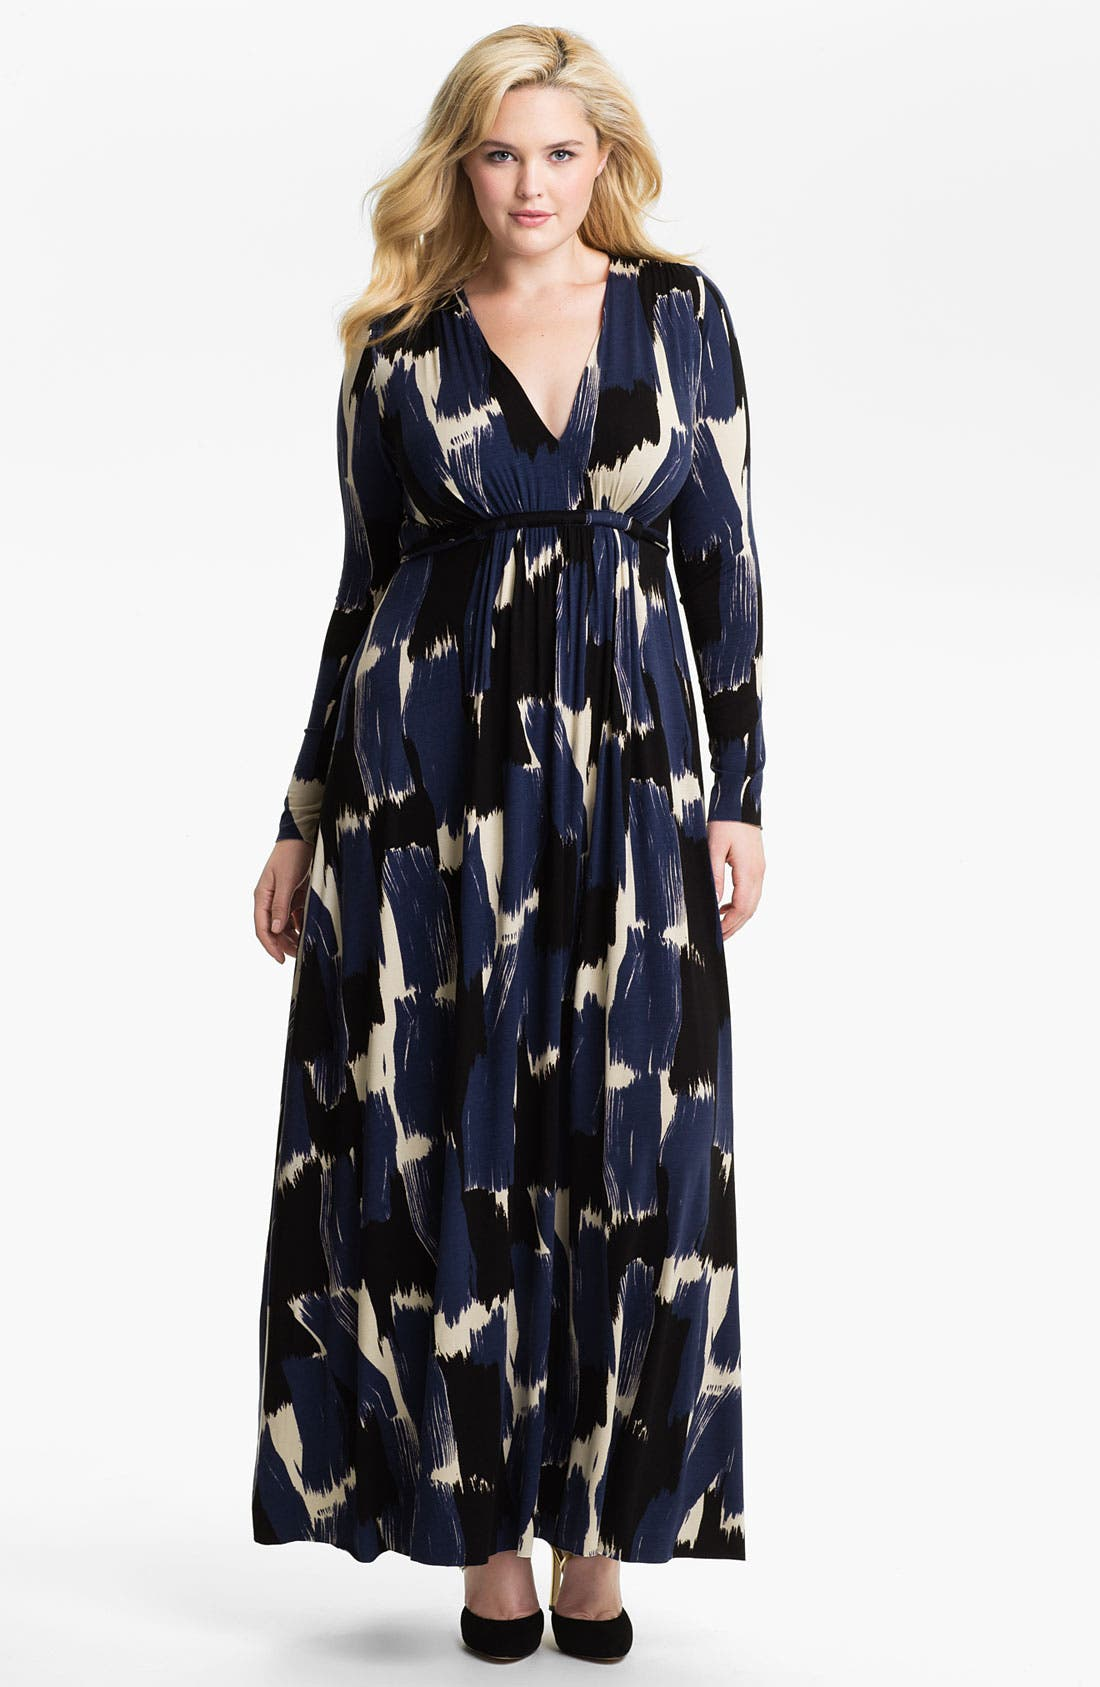 Alternate Image 1 Selected - Rachel Pally Long Sleeve Maxi Dress (Plus)